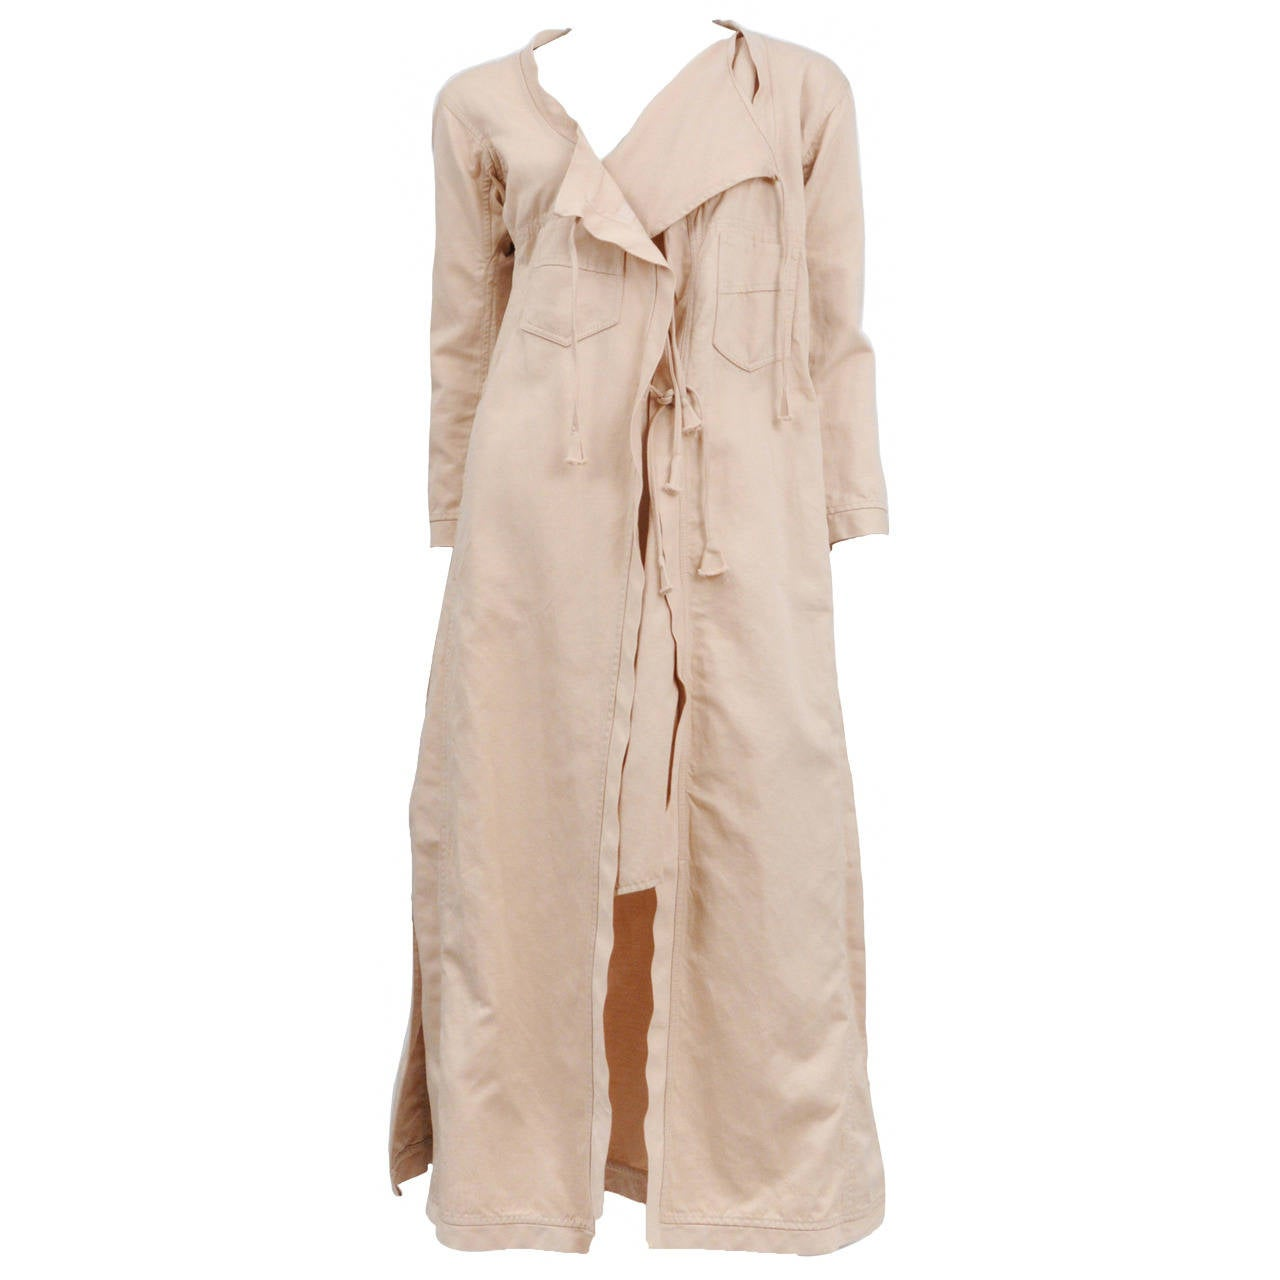 Gucci Cotton Duster Coat 1